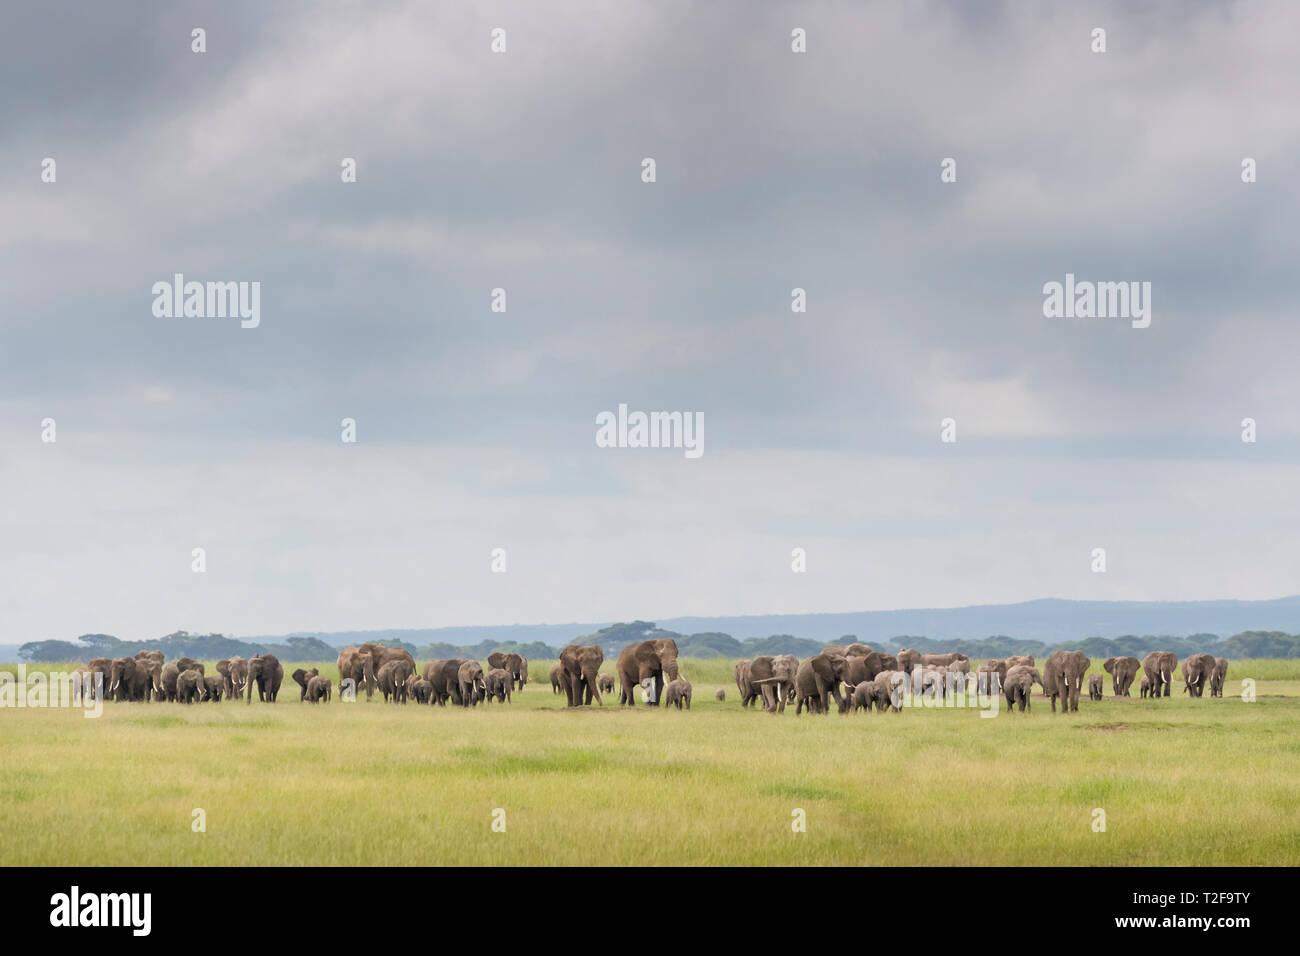 African elephant (Loxodonta africana) herd walking together on savanna, Amboseli national park, Kenya. - Stock Image